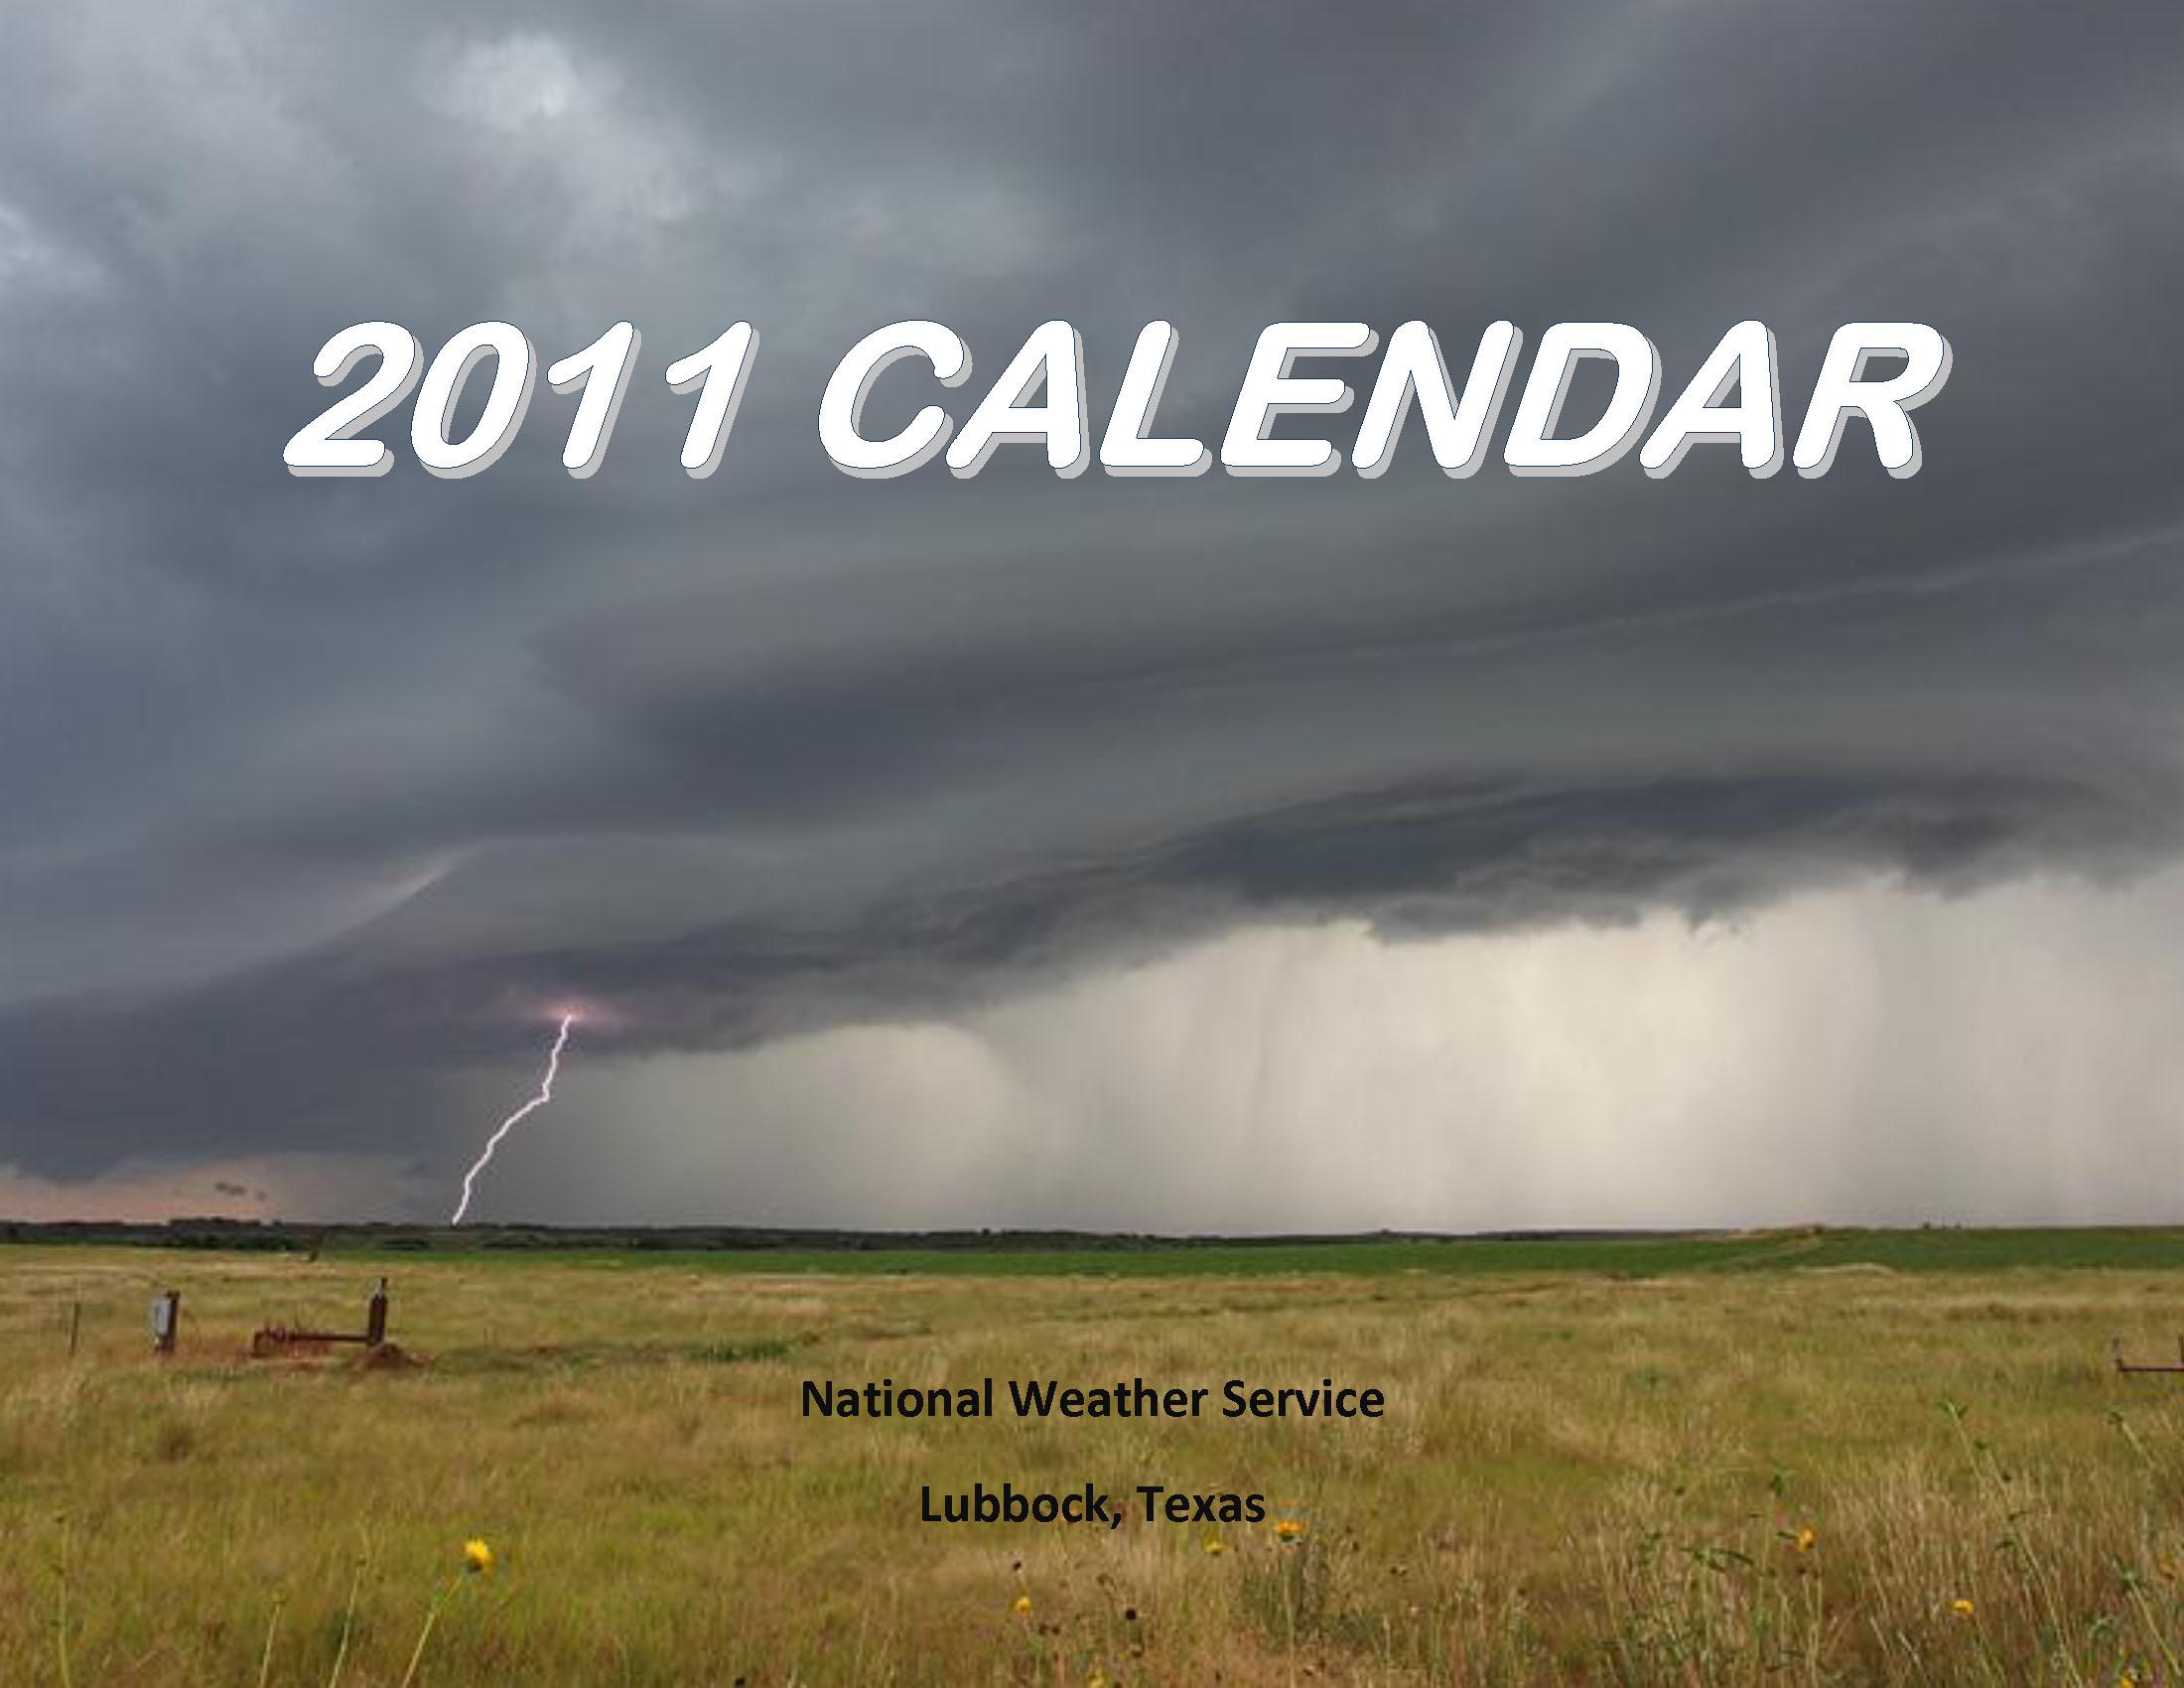 2011 NWS Lubbock calendar